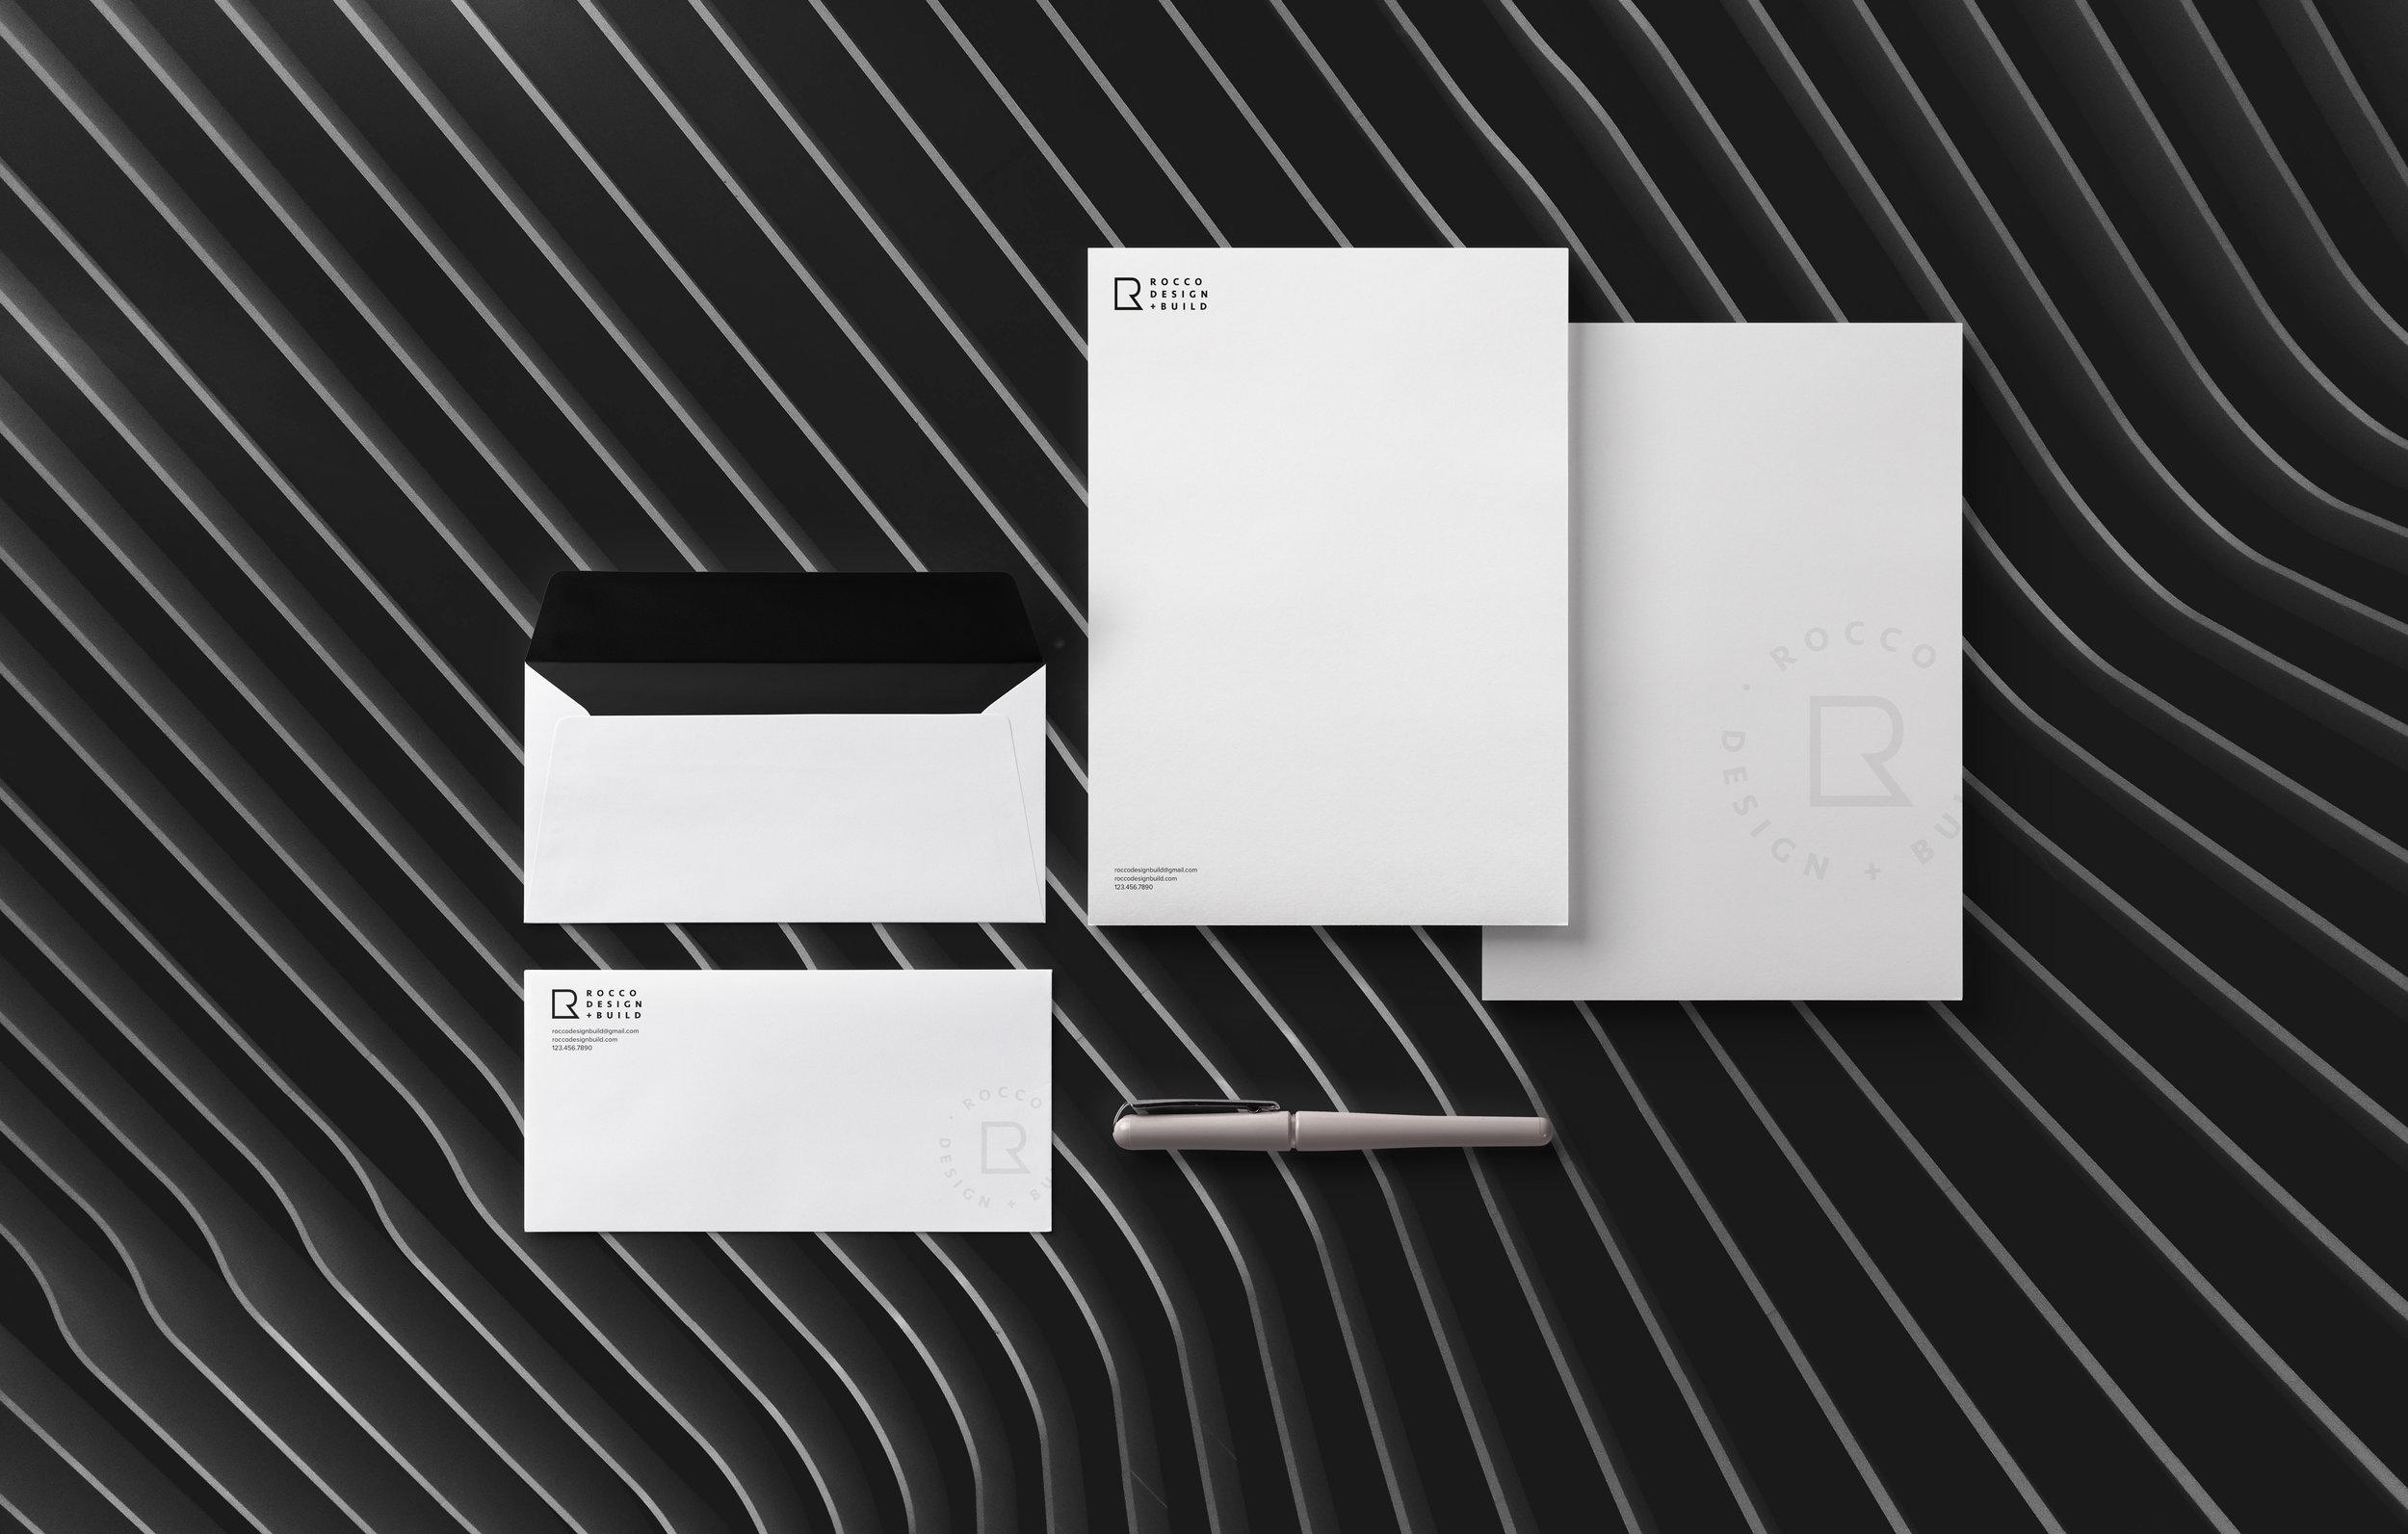 Ana-Juan-Gomez-branding-design-ROCCO-stationery.jpg